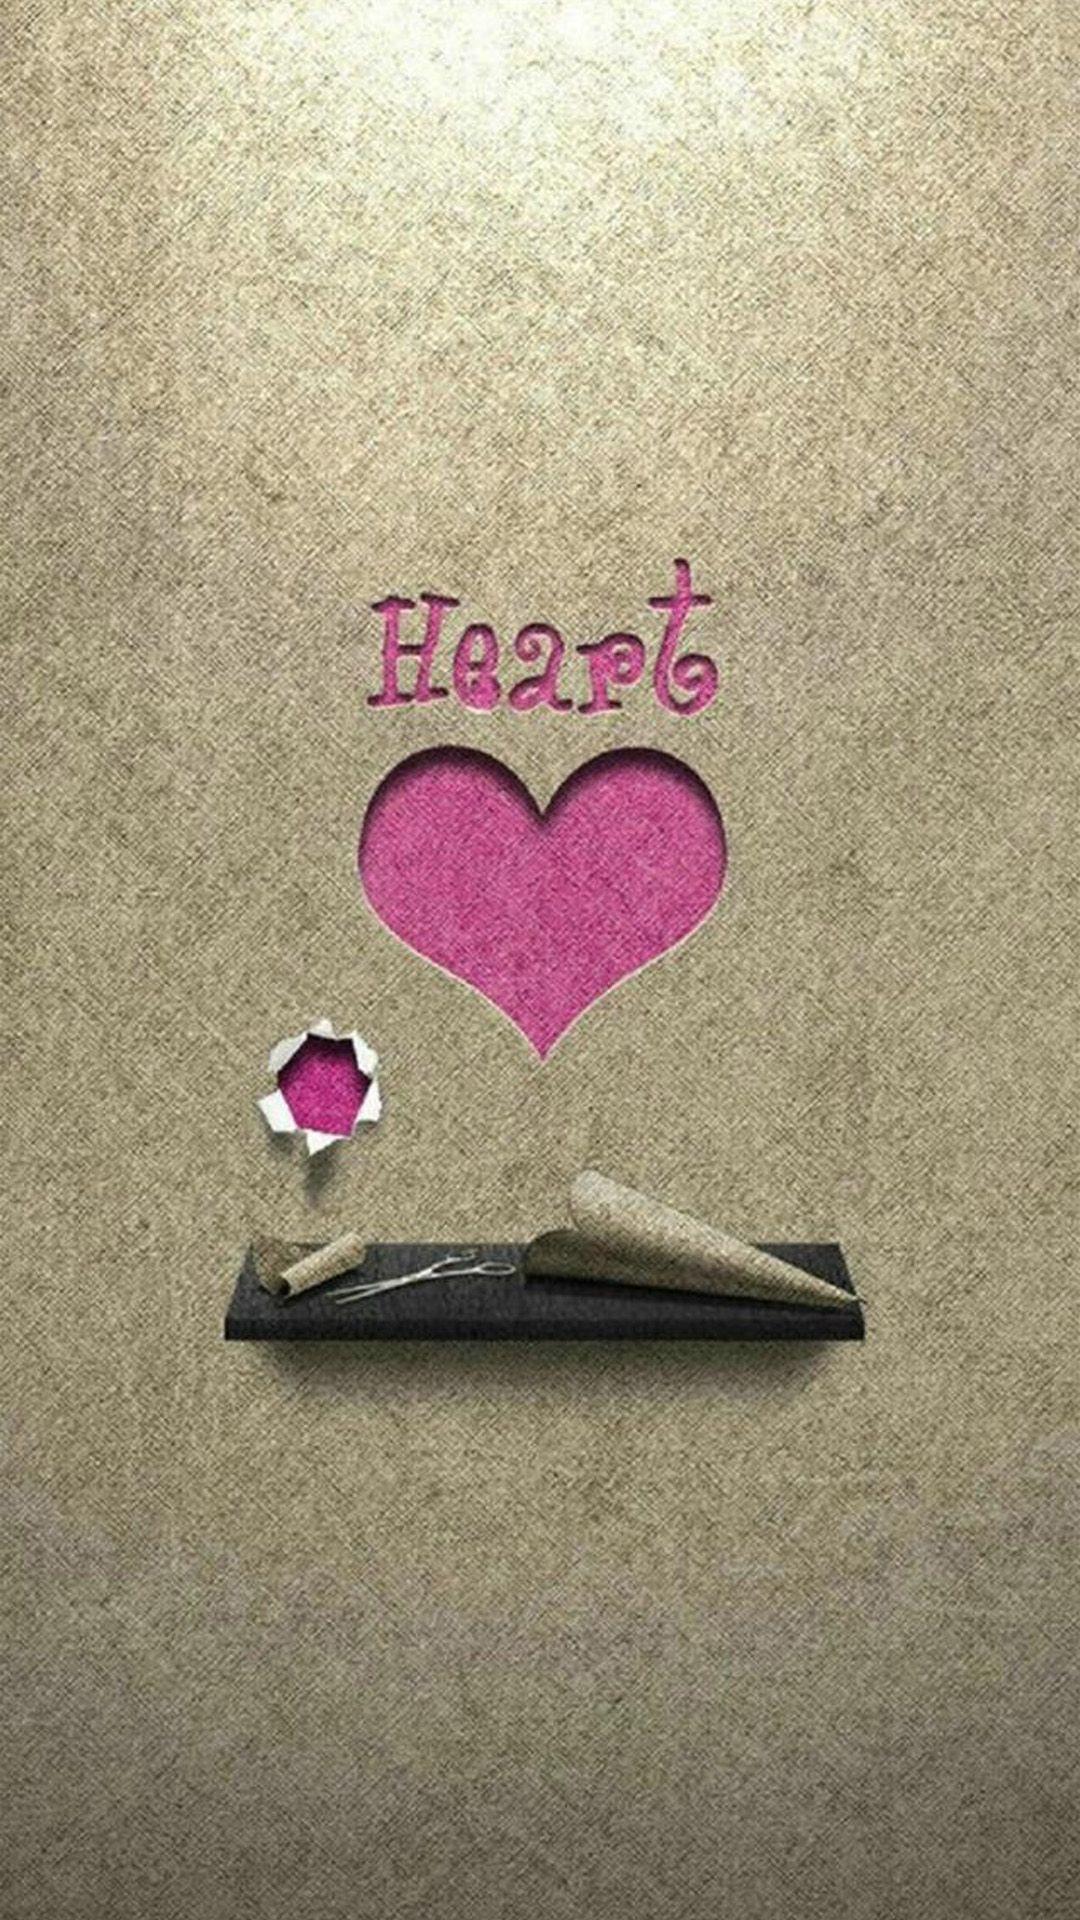 Heart Paper Cutting Background iPhone 7 wallpaper